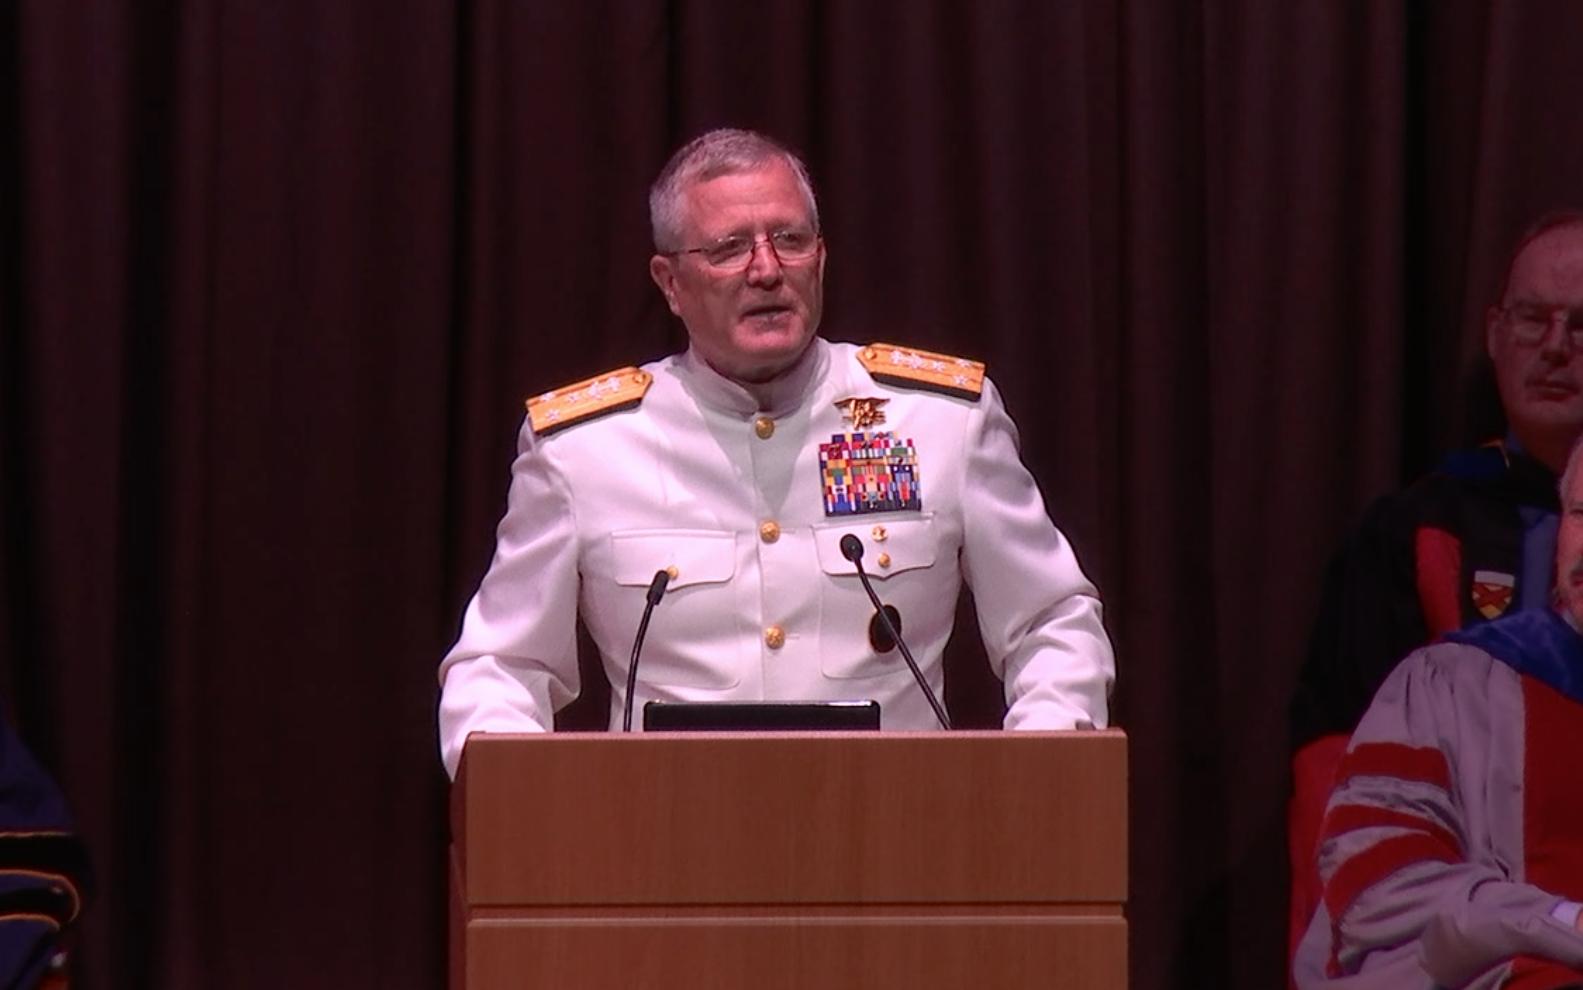 Naval Postgraduate School Graduation Ceremony